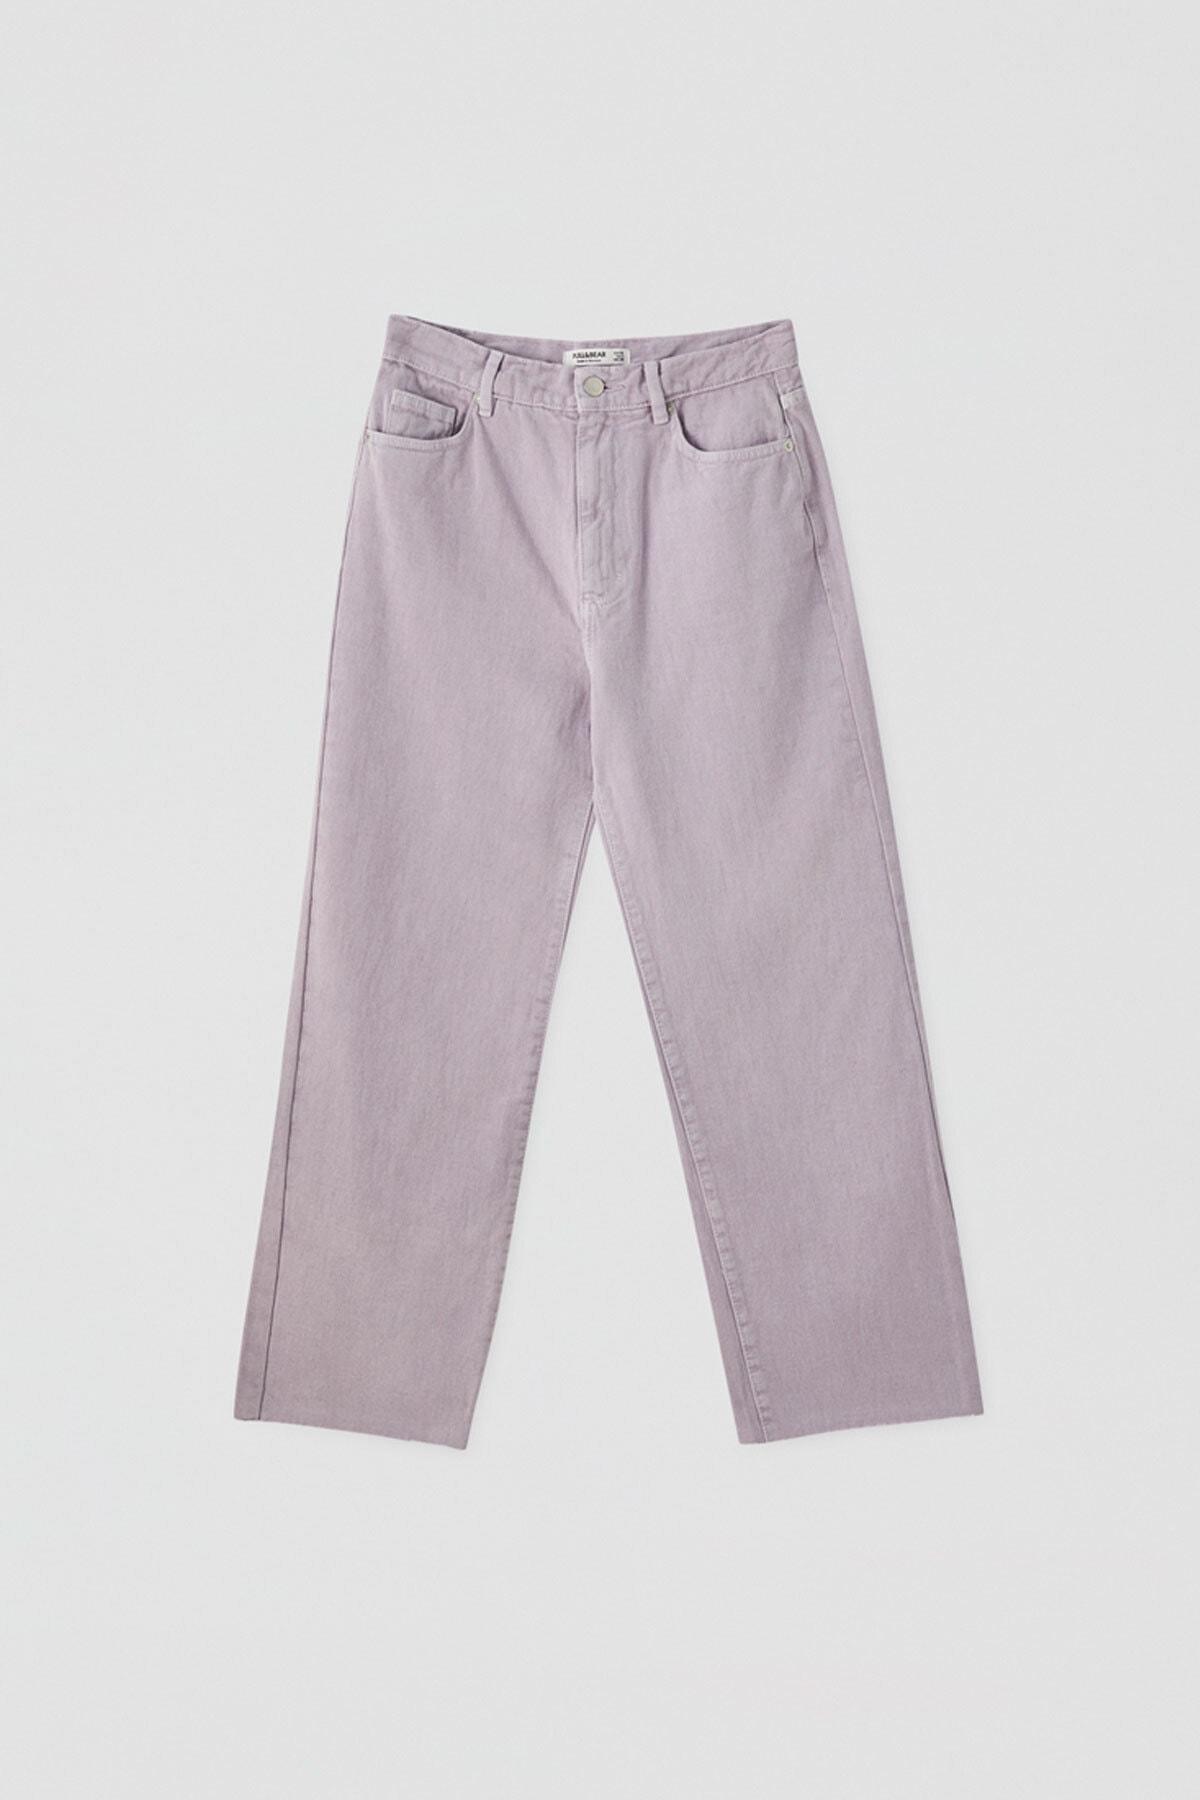 Pull & Bear Kadın Leylak Crop Straight Fit Jean 05670330 0